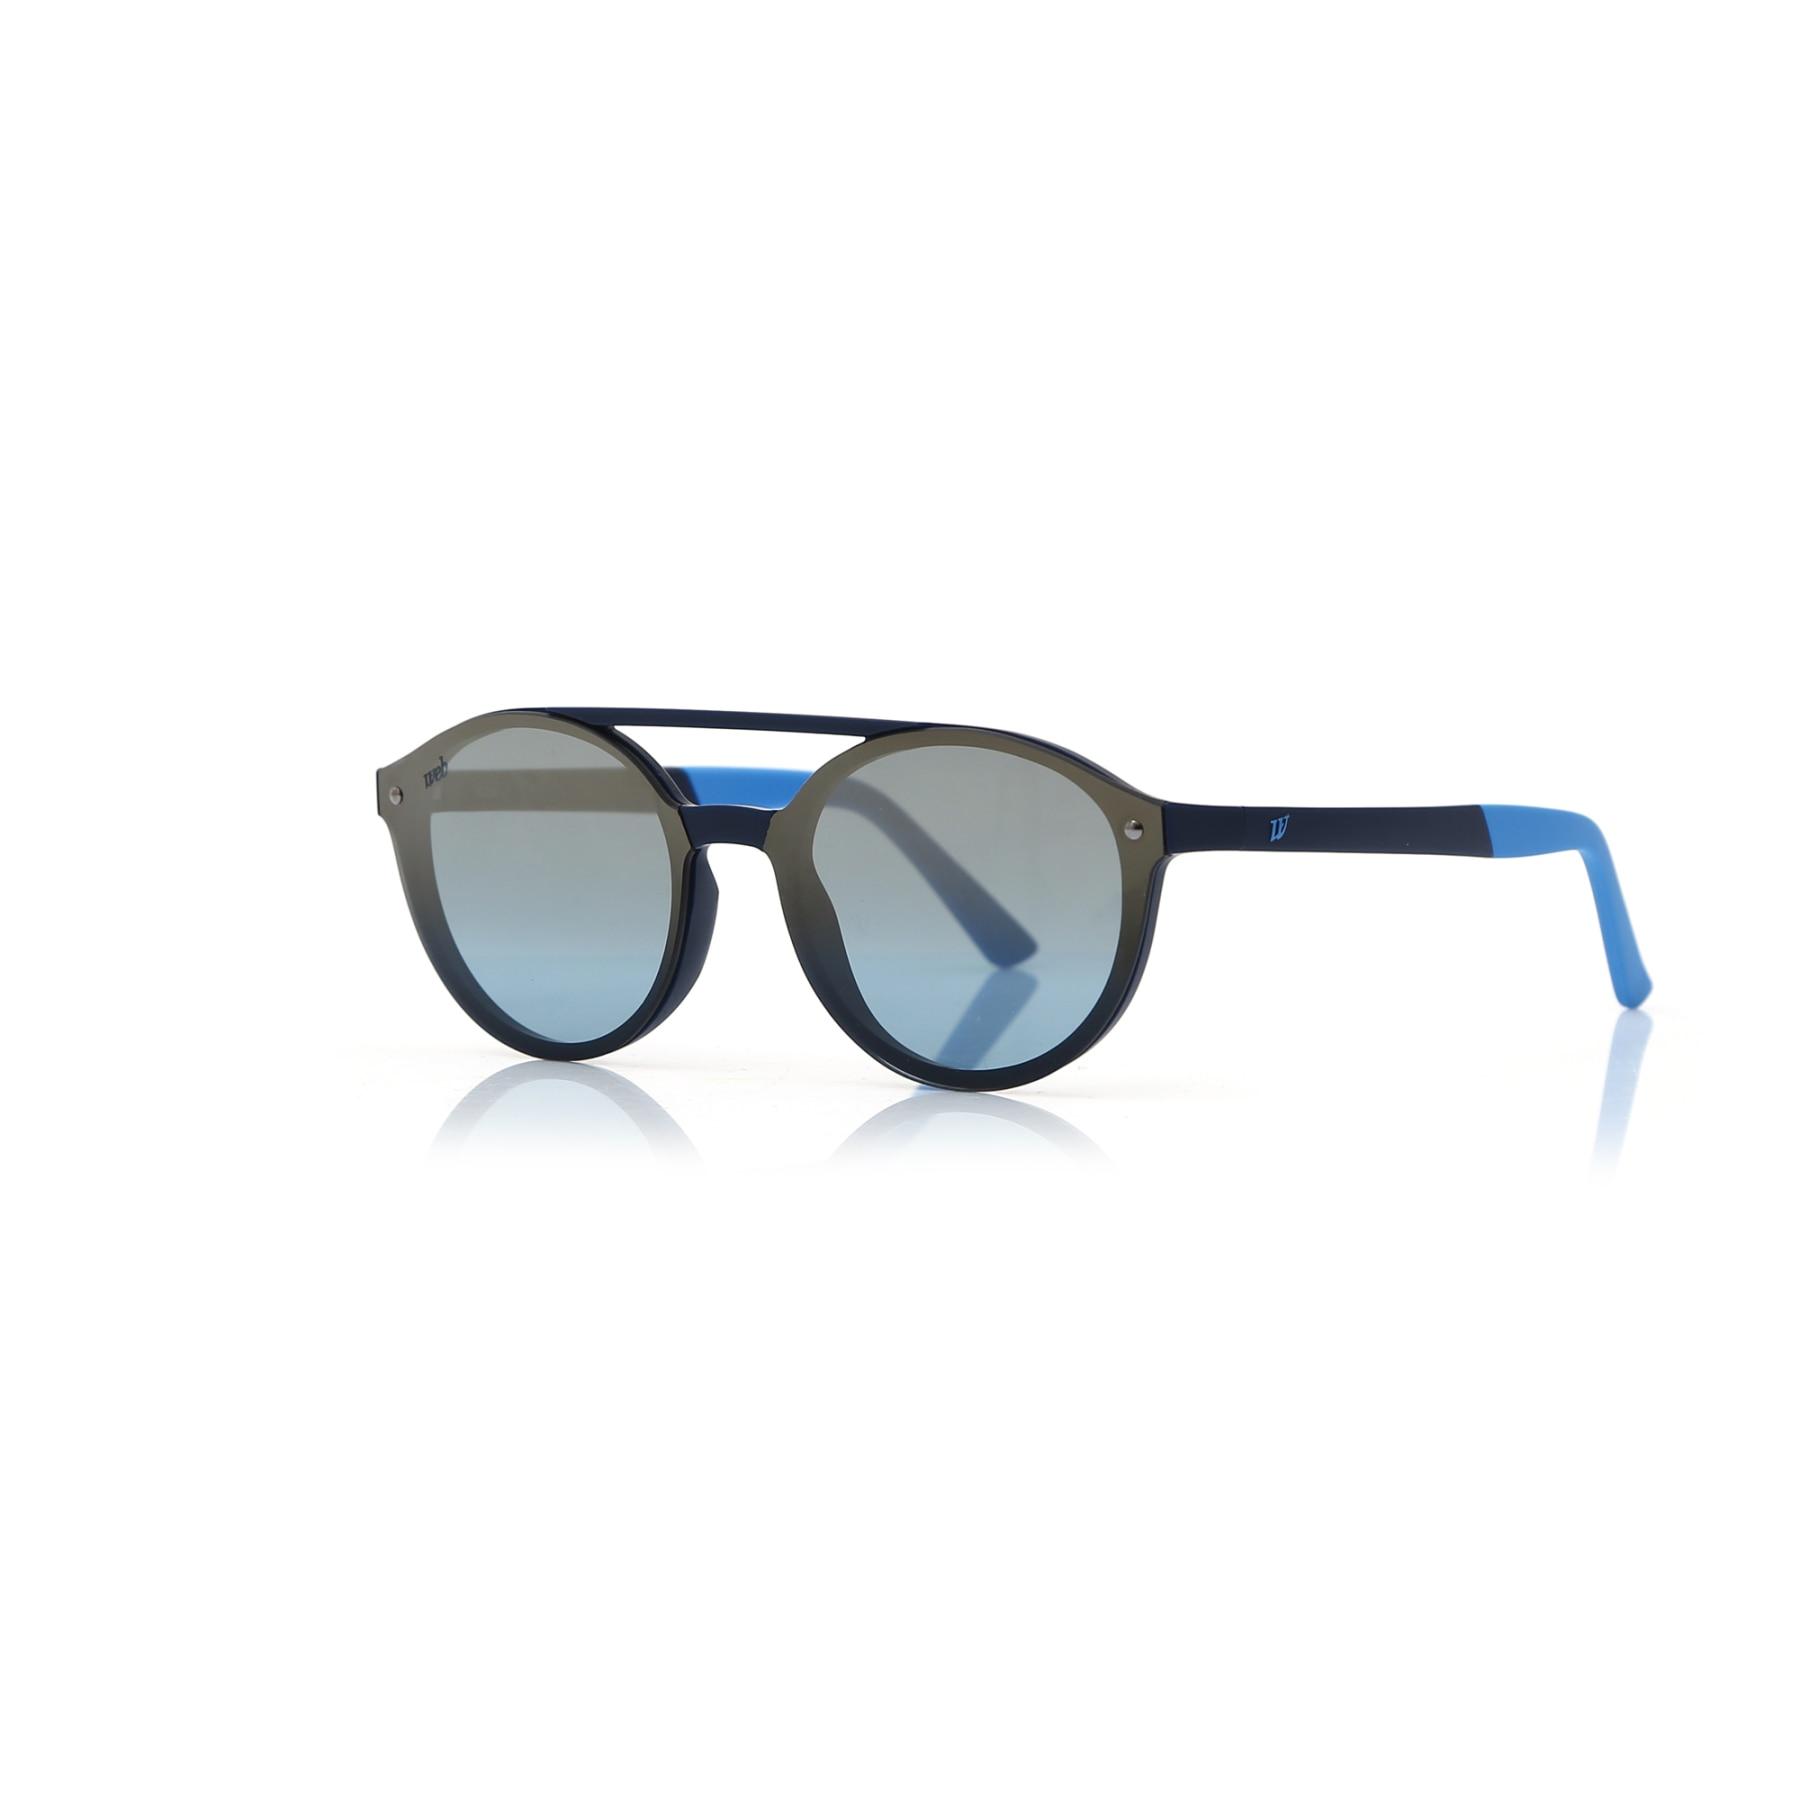 Unisex sunglasses w 0184 91x bone navy blue polycarbonate oval aval 61-12-140 web